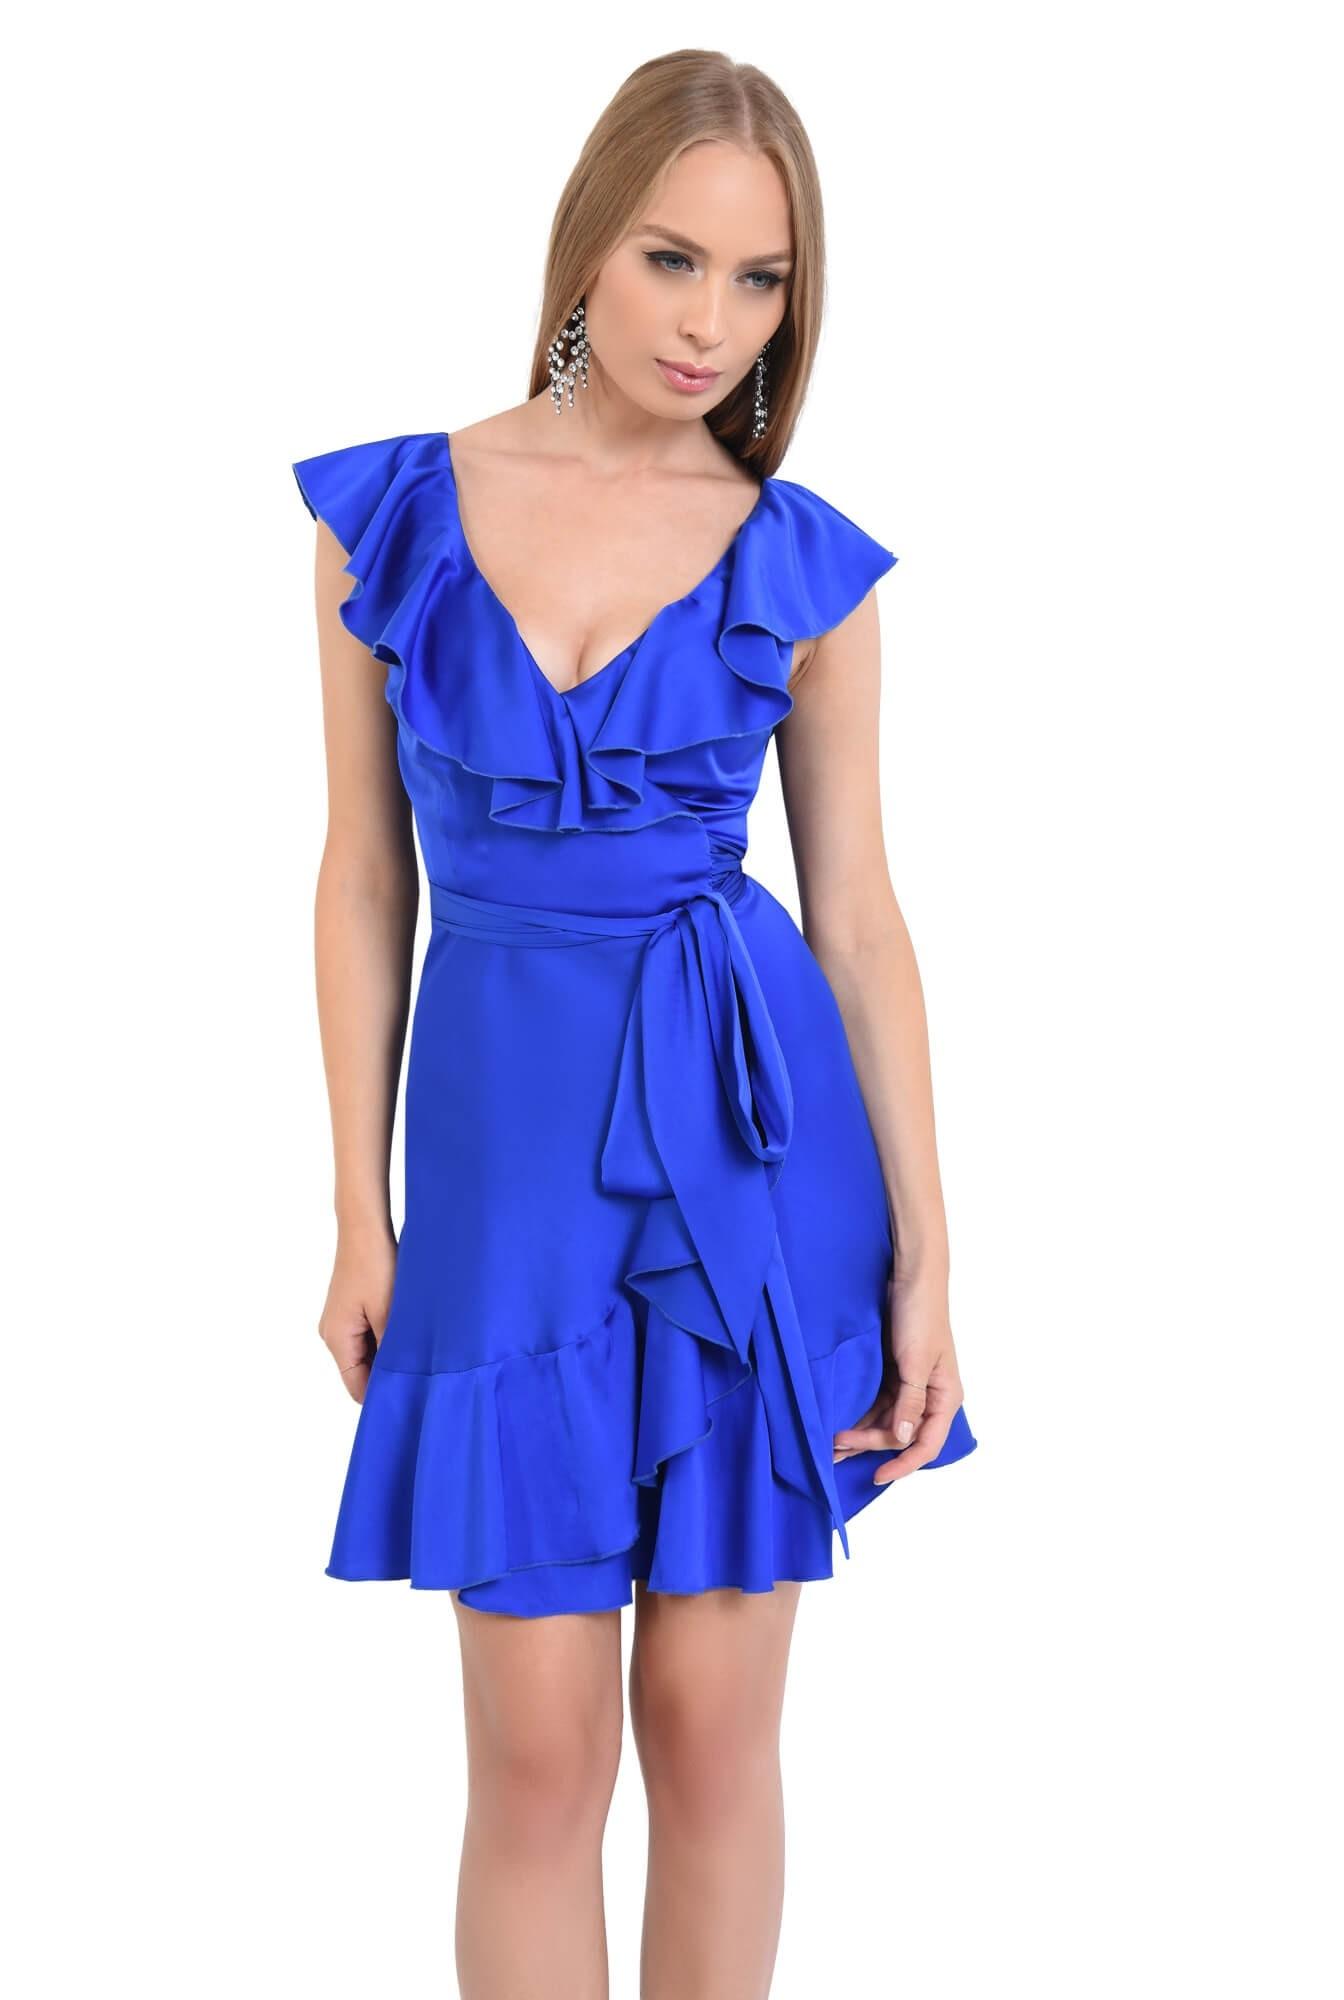 0 - rochie de seara, scurta, albastru, electric, volane, cordon